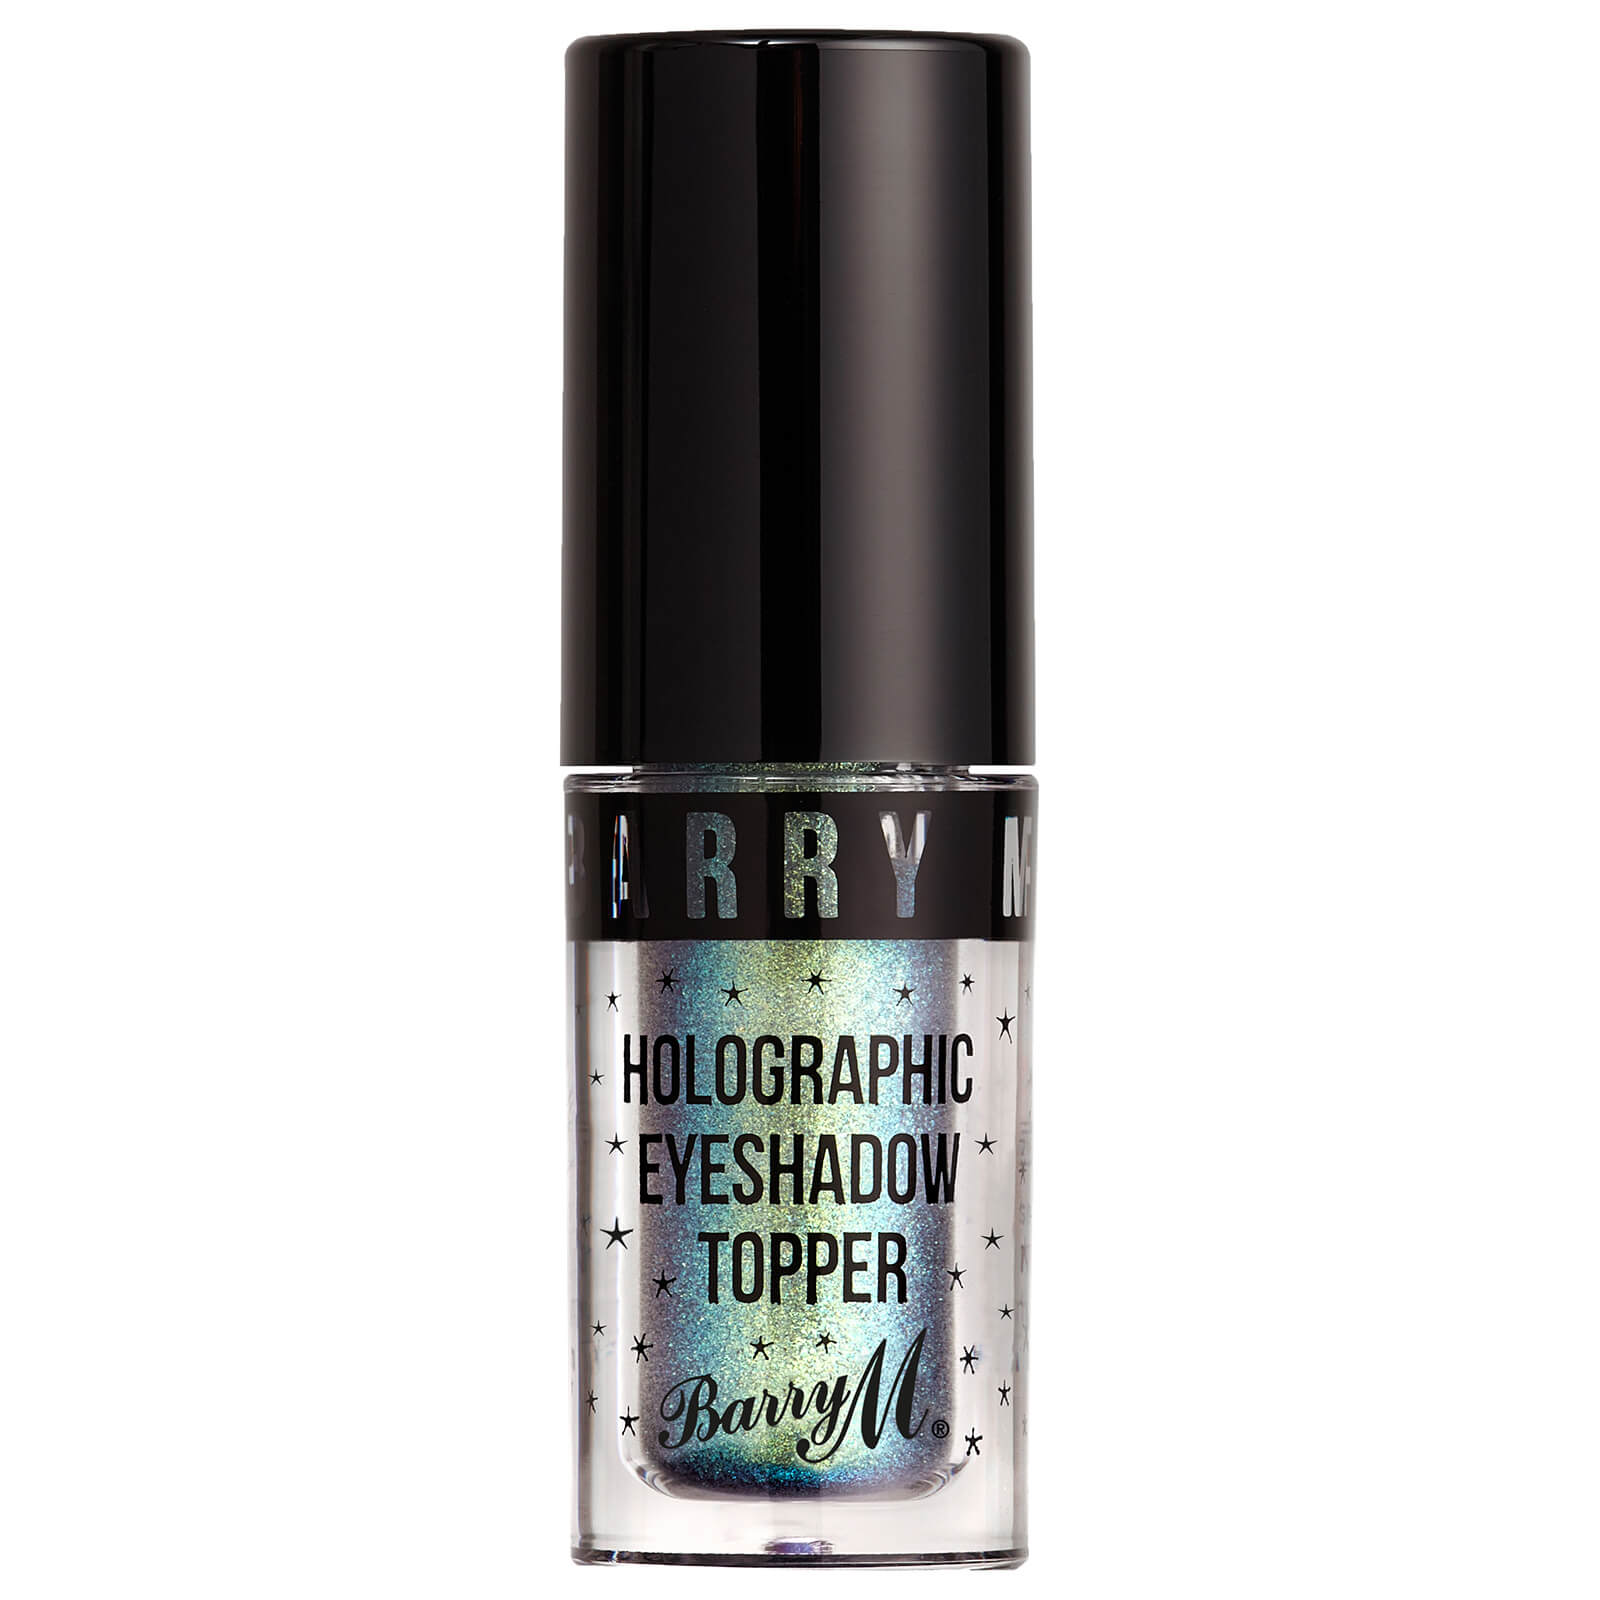 Купить Barry M Cosmetics Holographic Eye Topper (Various Shades) - Green/Gold